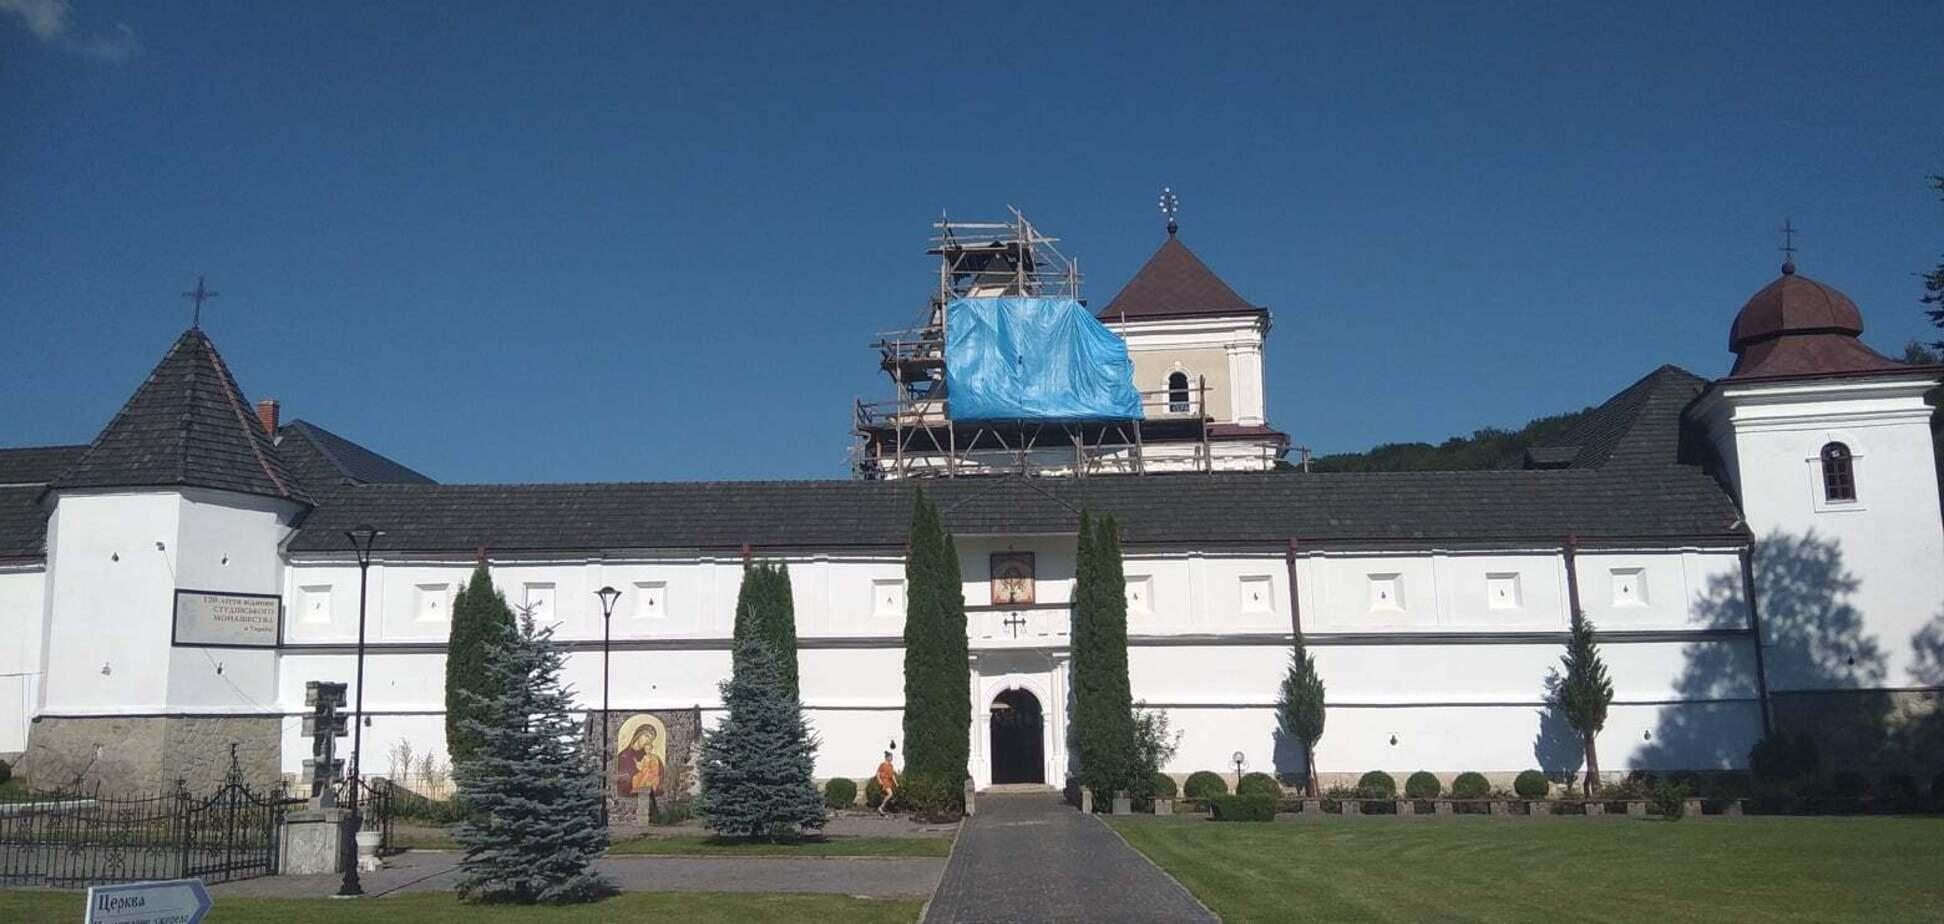 Святоуспенскую лавру на Львовщине закрыли на карантин из-за вспышки COVID-19